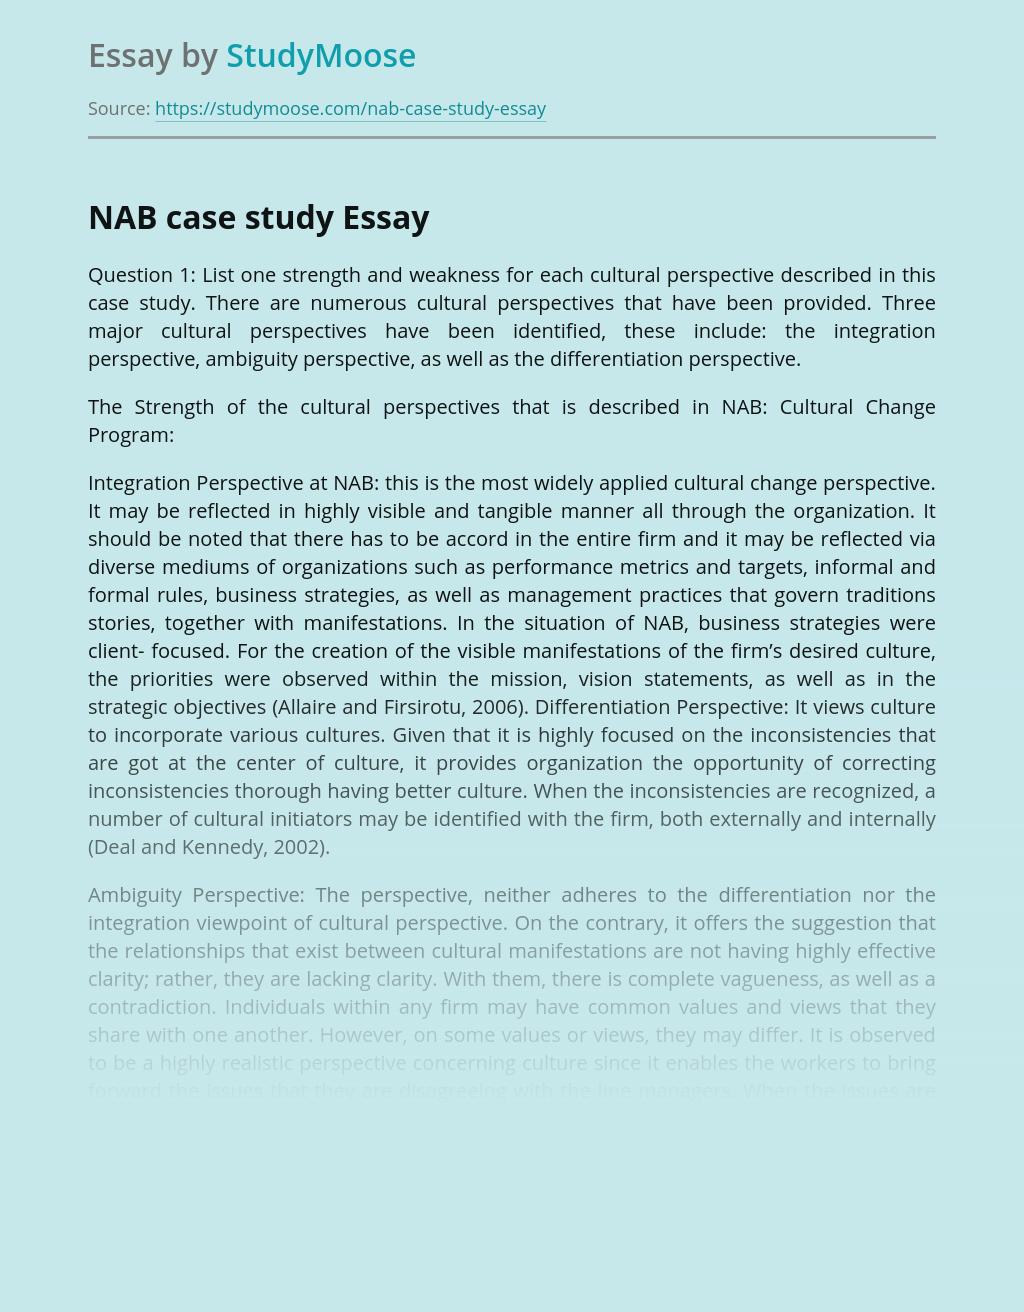 NAB case study